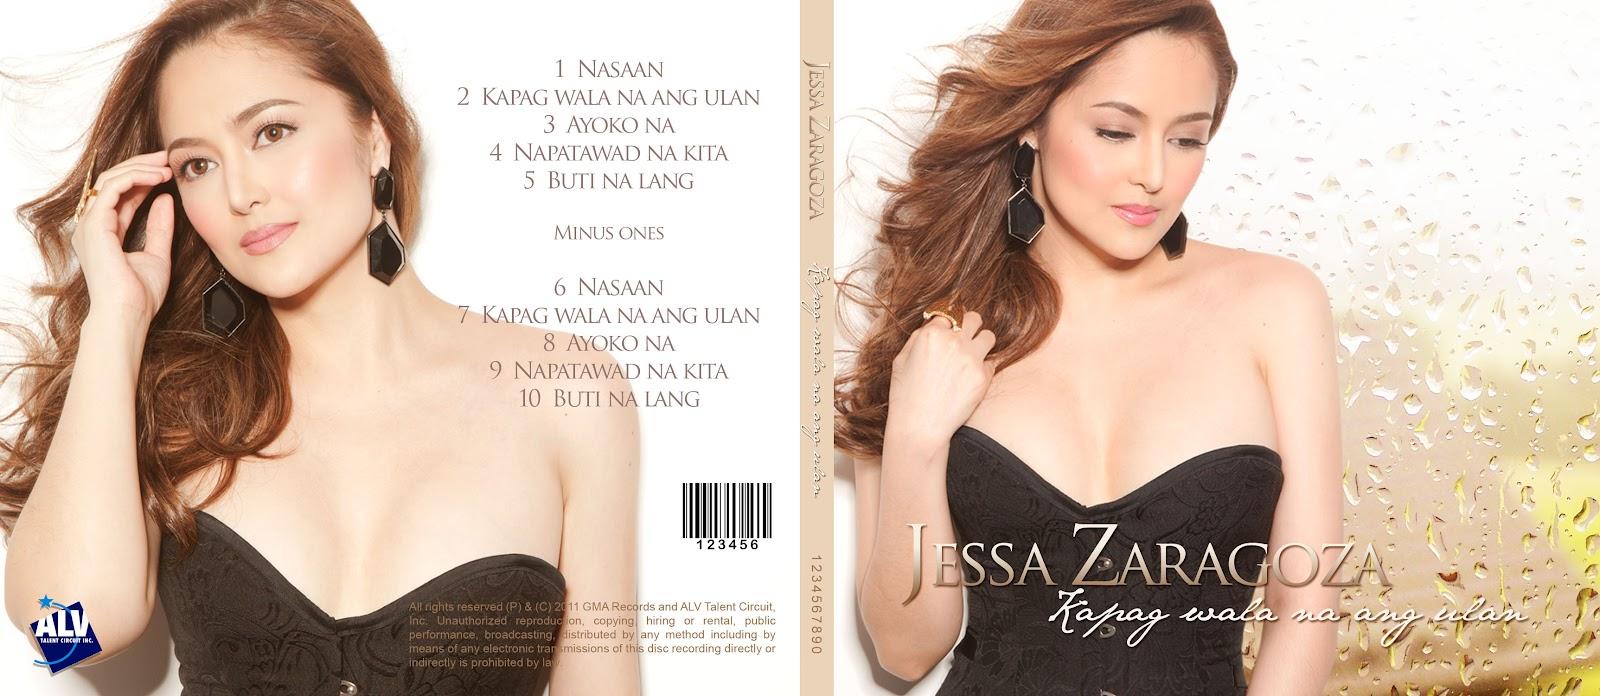 Jessa Zaragoza (b. 1978) nudes (28 photos), Tits, Is a cute, Twitter, lingerie 2017